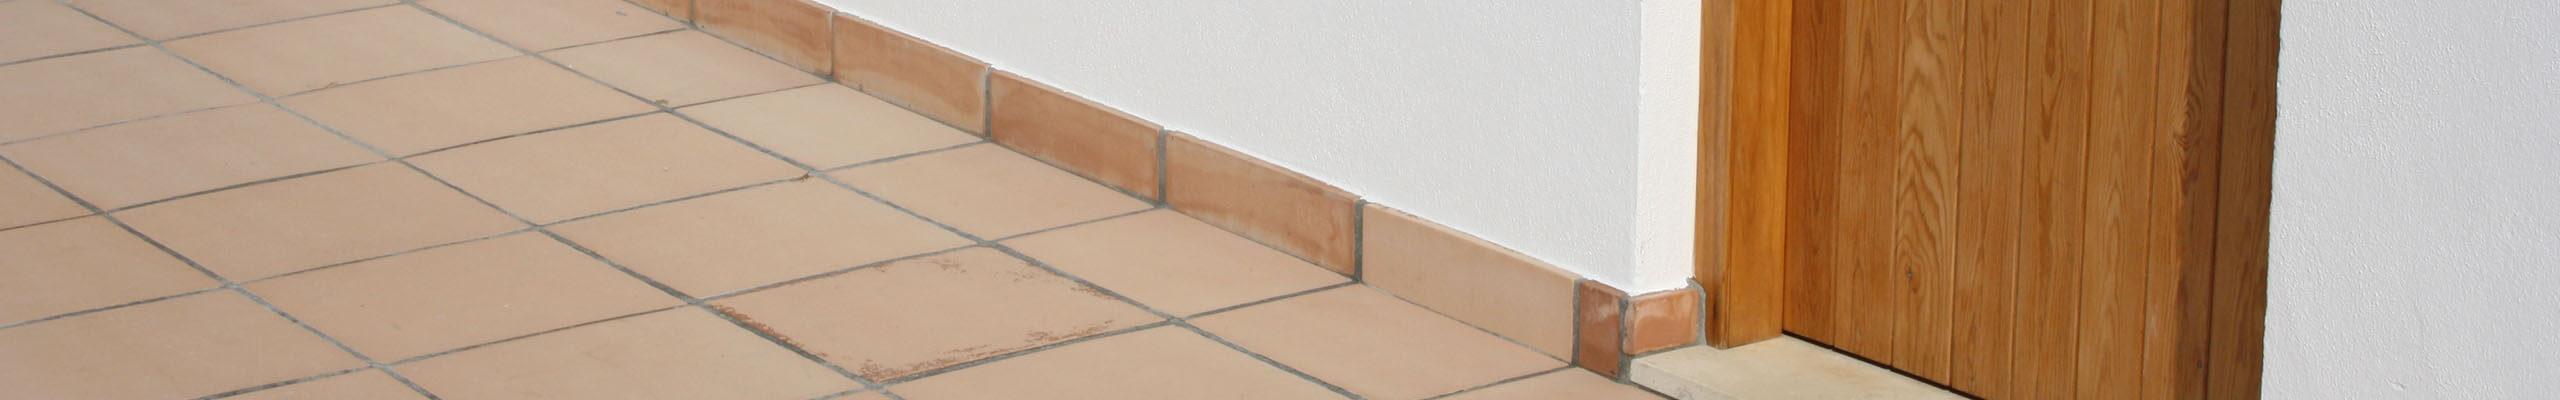 terracota-extrusionada-cana-natural-banner